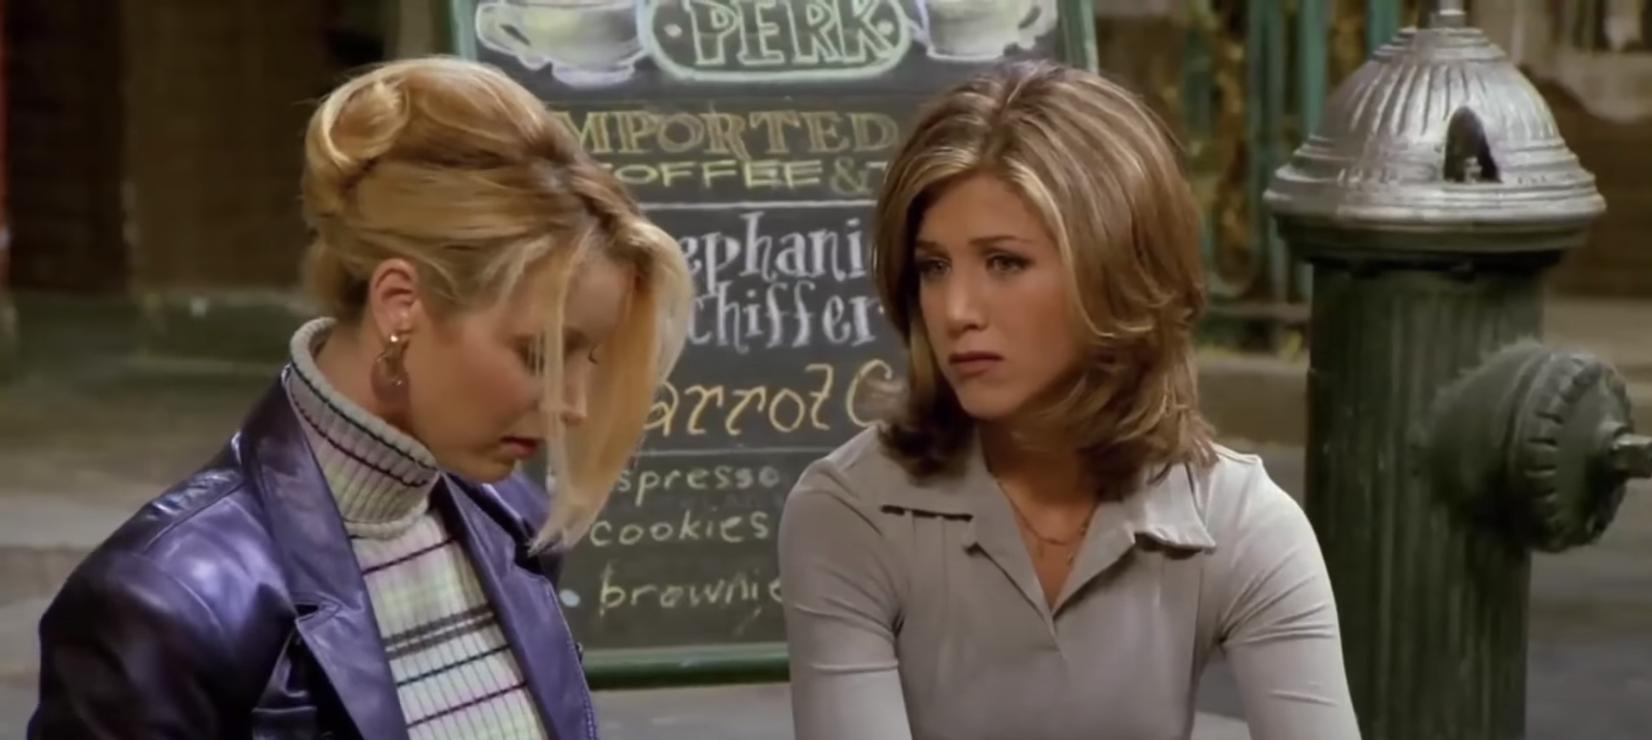 Phoebe and Rachel having a conversation on the sidewalk